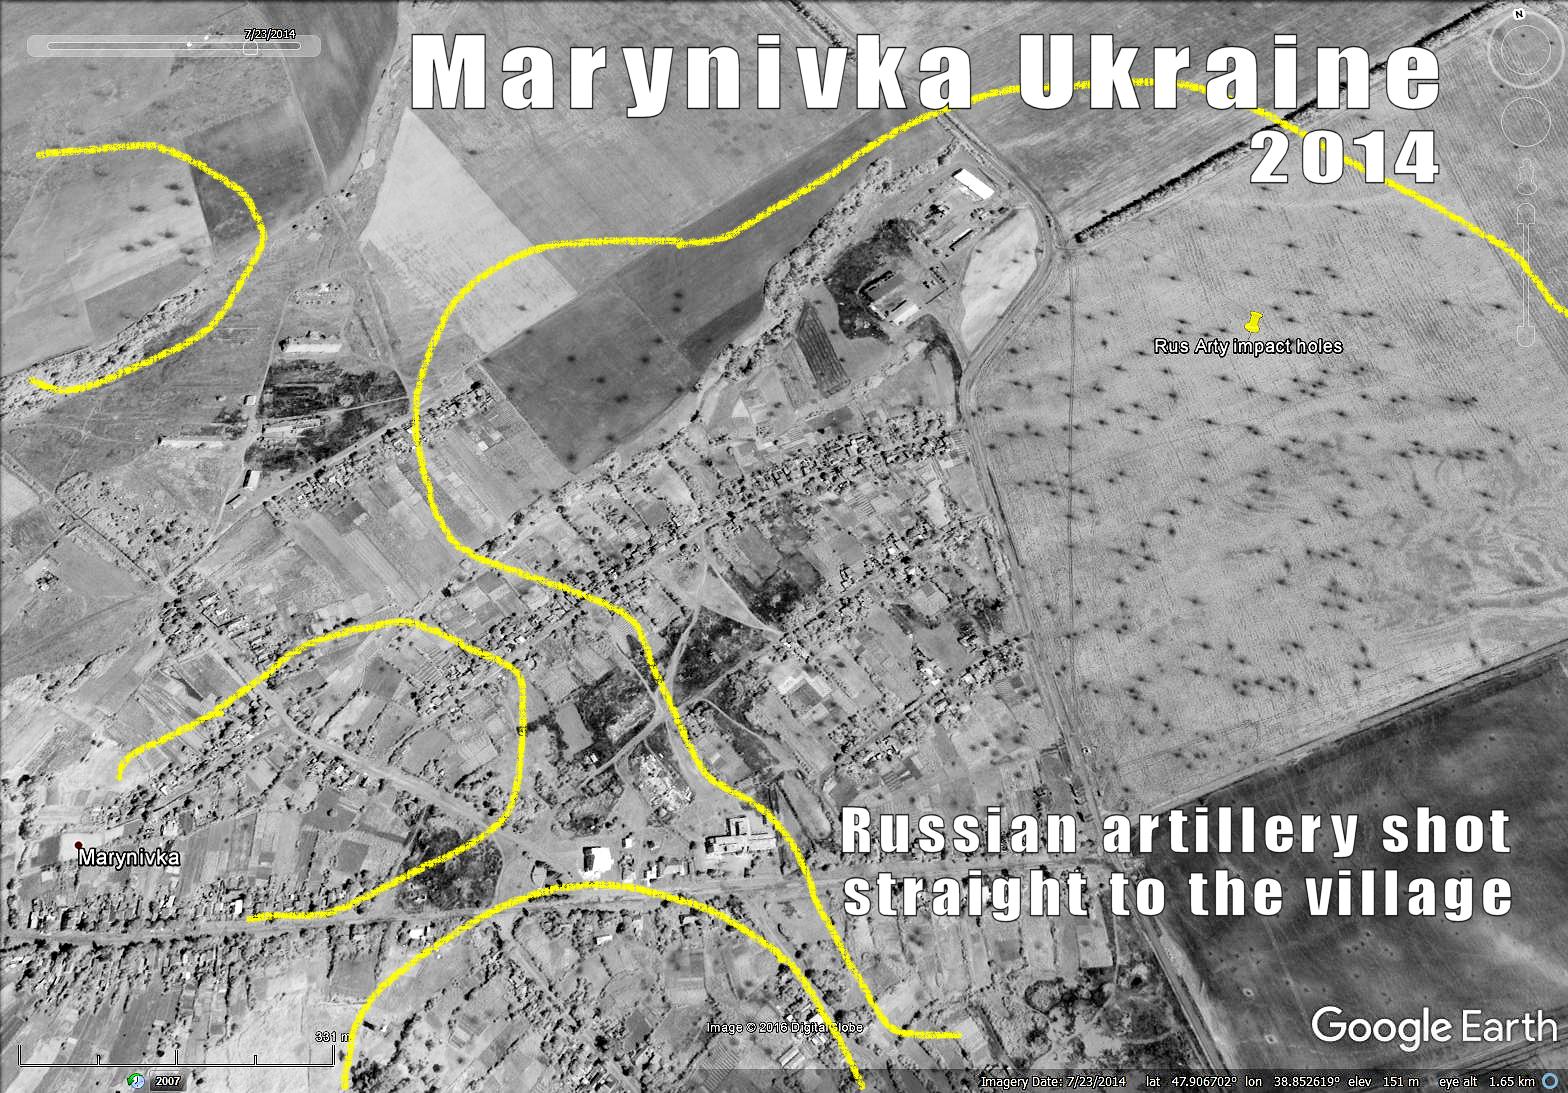 Russia Map After Ww2%0A Kaliningrad Yantarny  Two units  Electronic Warfare Center and    rd AD RGT  Battery  S       Maps  Screencaptures etc stuff   Pinterest   Warfare